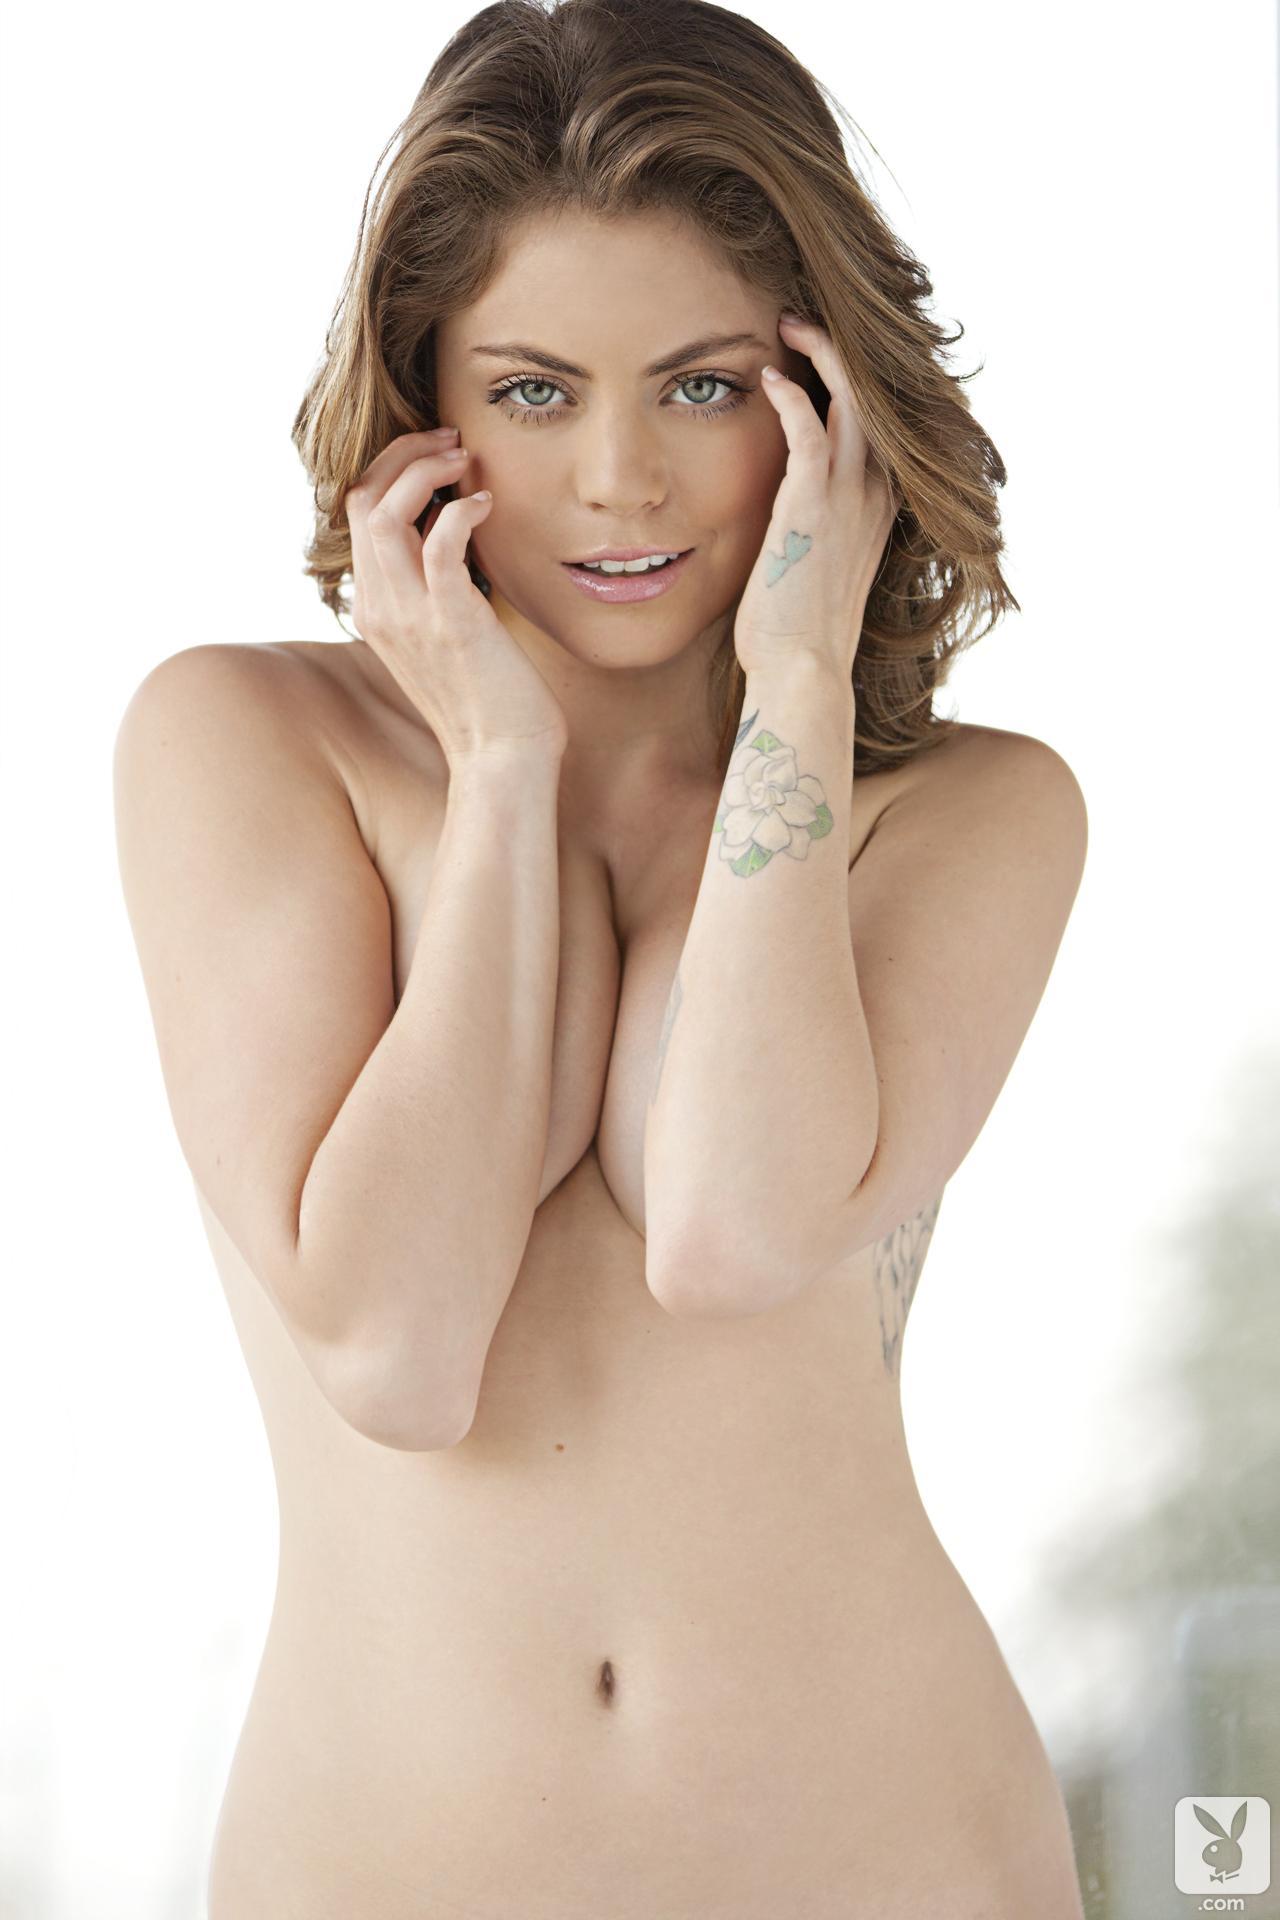 Playboy.com   Alie Craig - The Girl Friend Type